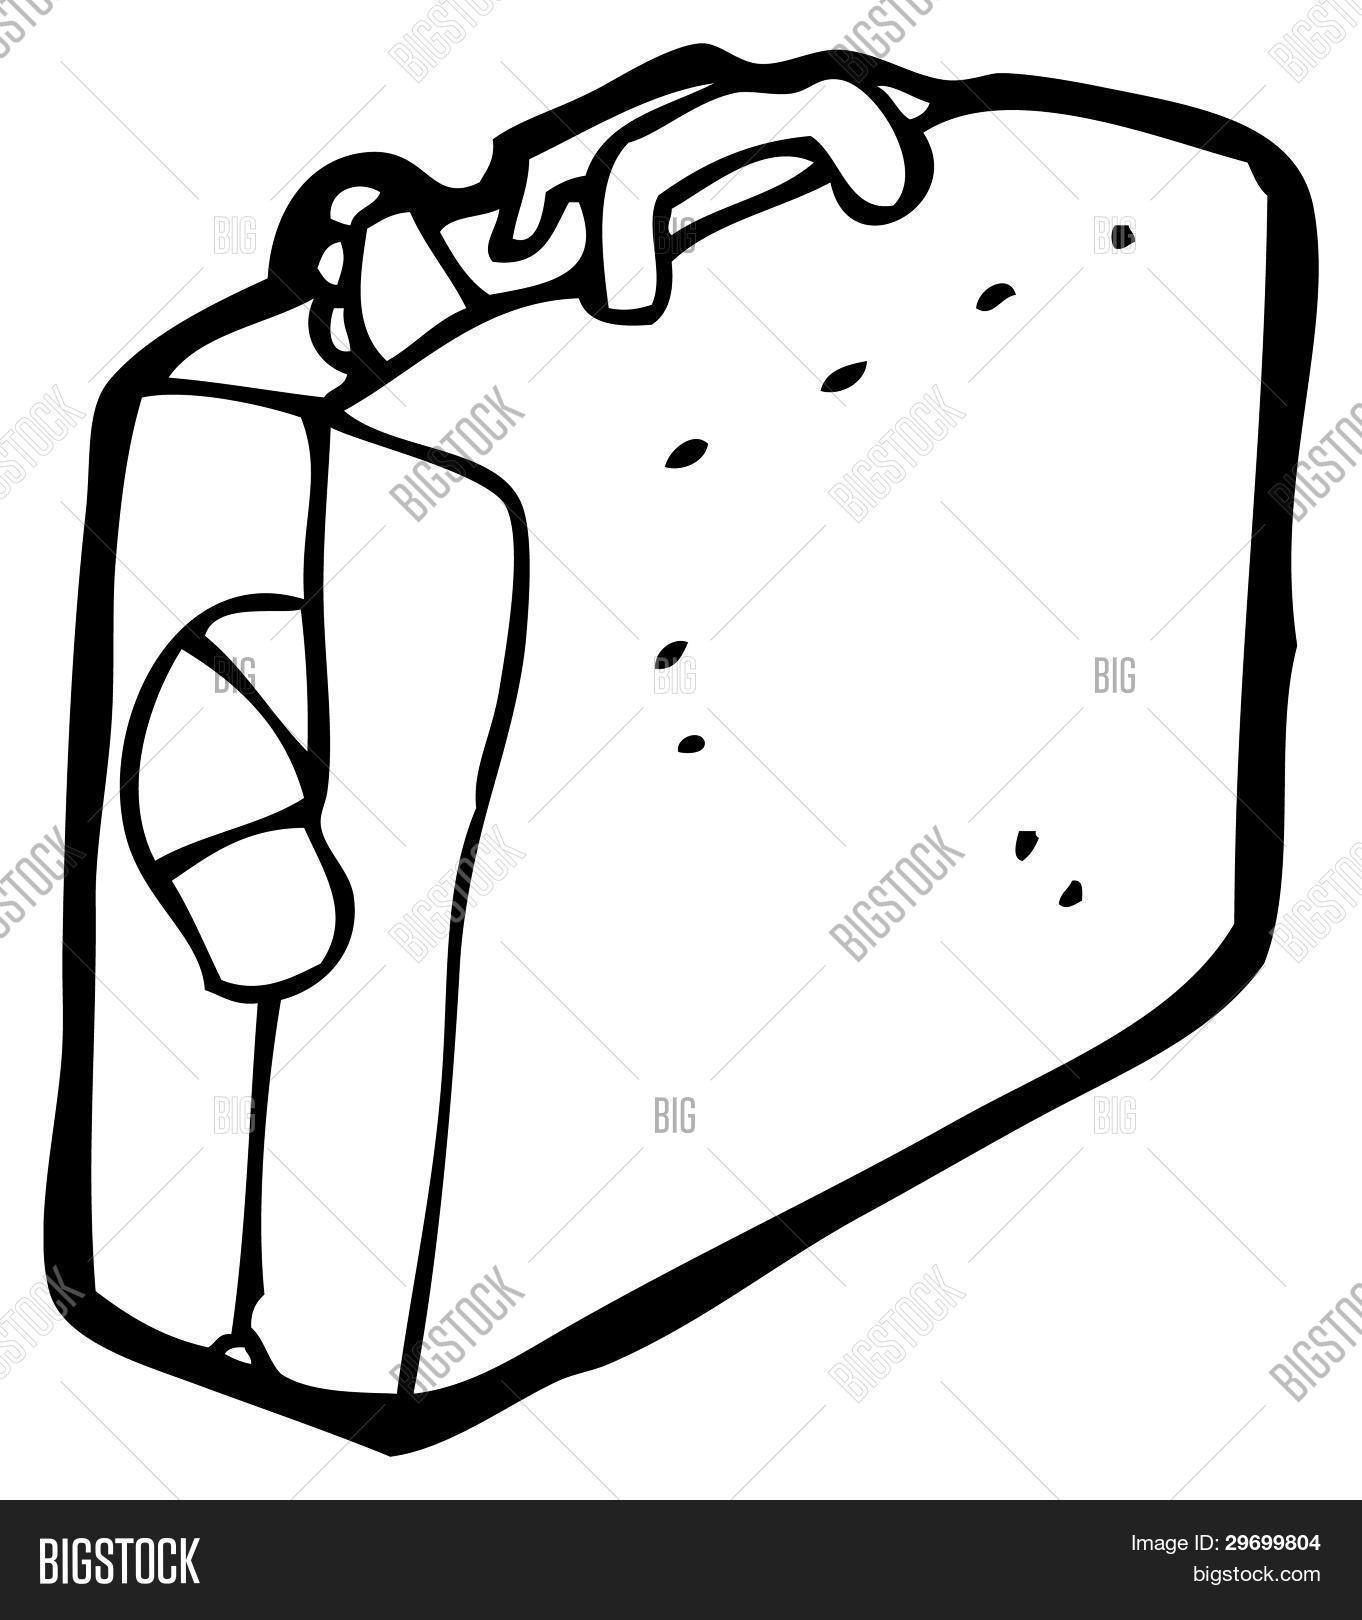 Full Luggage Suitcase Cartoon Raster Version Stock Photo